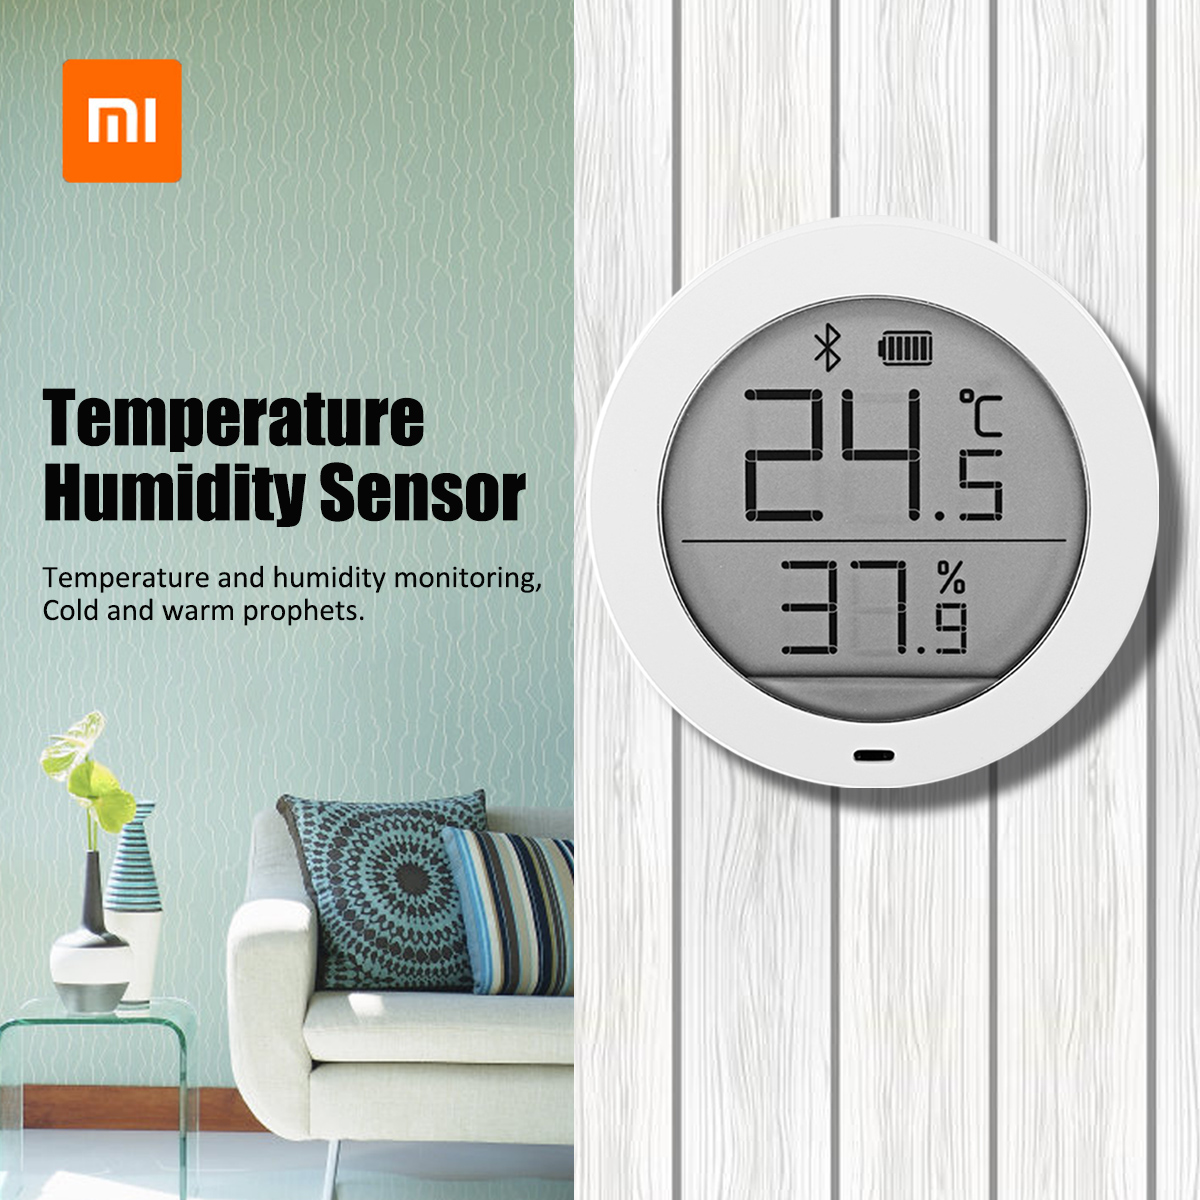 Original Xiaomi Mijia Bluetooth Temperature Humidity Sensor LCD Digital Thermometer Hygrometer Moisture Meter with Battery цена 2017